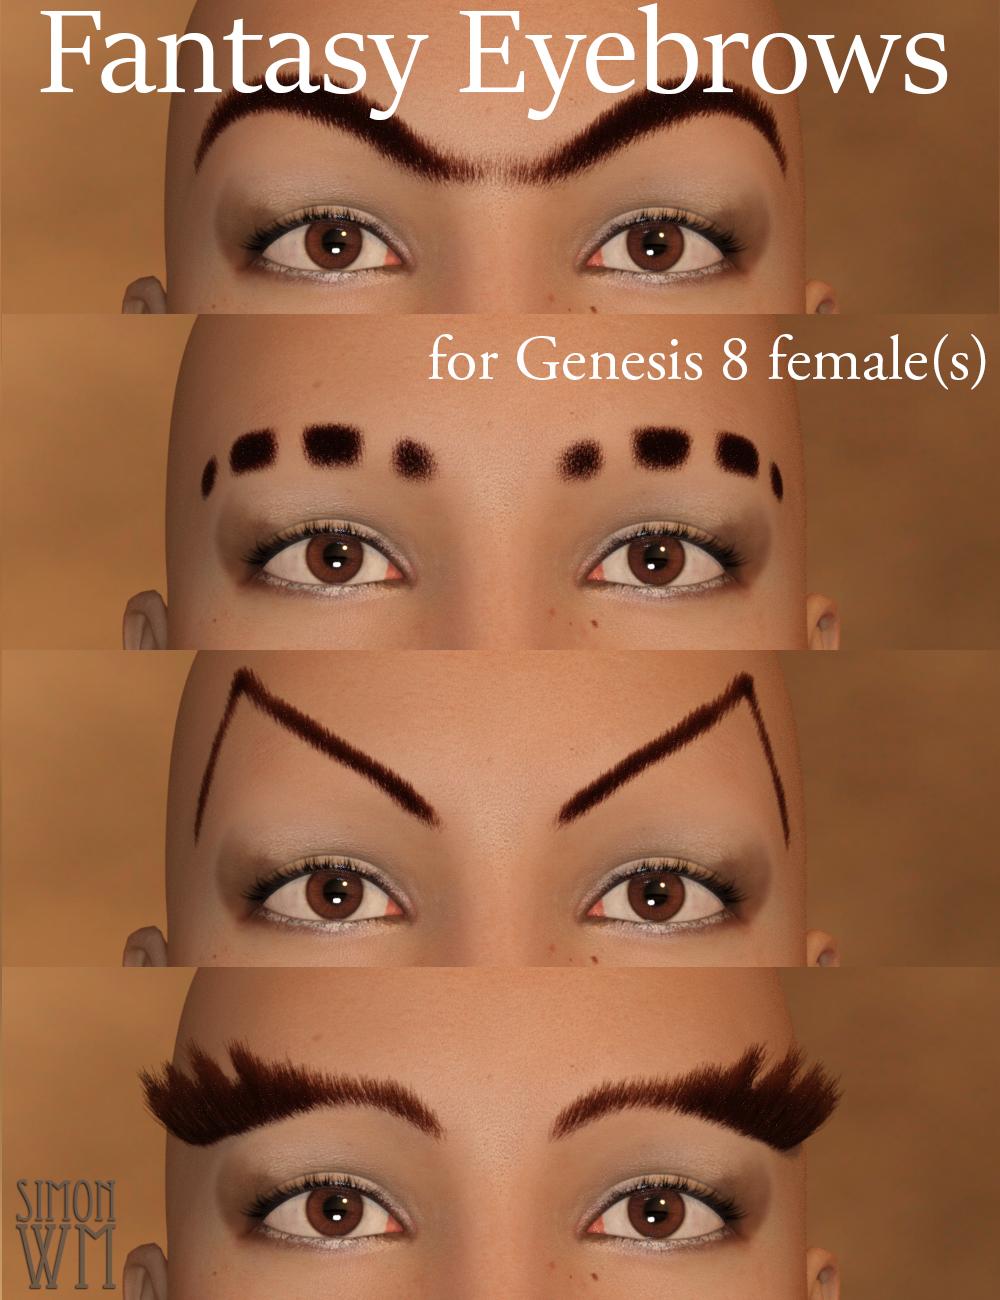 Fantasy Eyebrows for Genesis 8 Female(s) by: SimonWM, 3D Models by Daz 3D